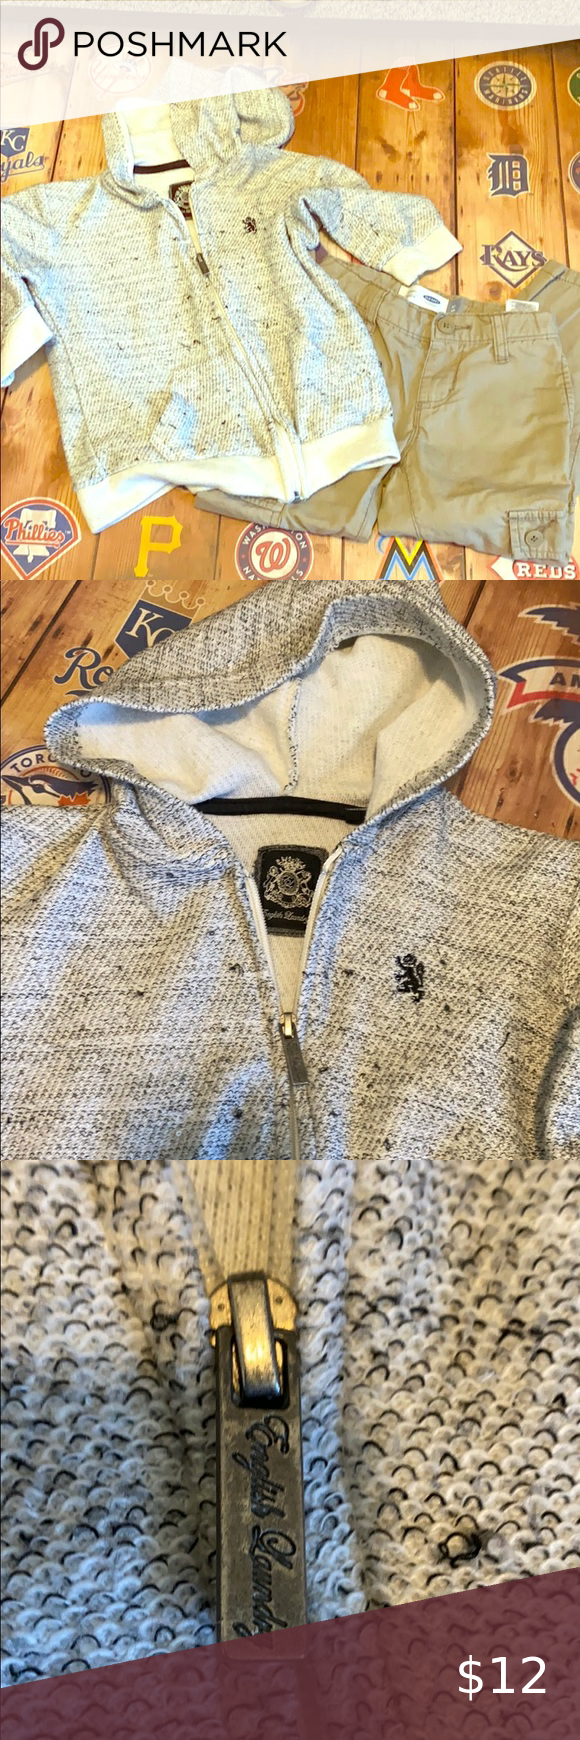 English Laundry Sweater Jacket And On Pants 4t English Laundry Zip Up Hooded Jacket Grey Marled Looking Knit Awesome Con Sweater Jacket English Laundry Pants [ 1740 x 580 Pixel ]